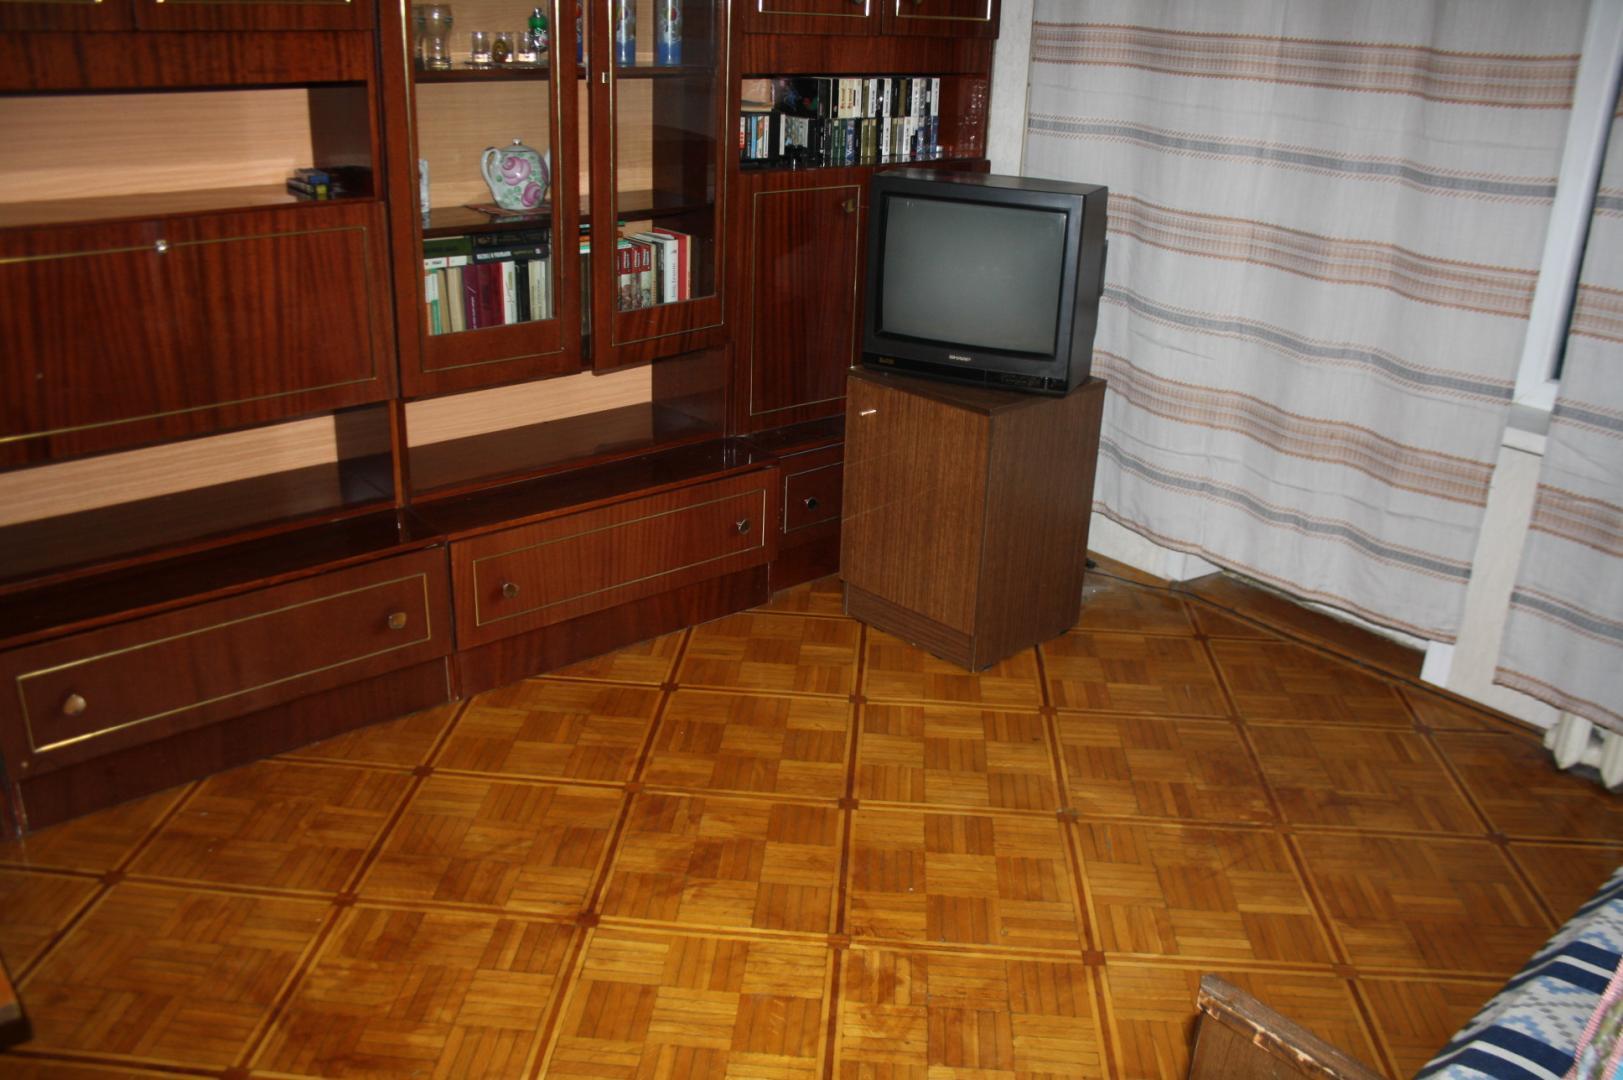 Квартира, 1 комната, 35 м² в Люберцах 89160792833 купить 1